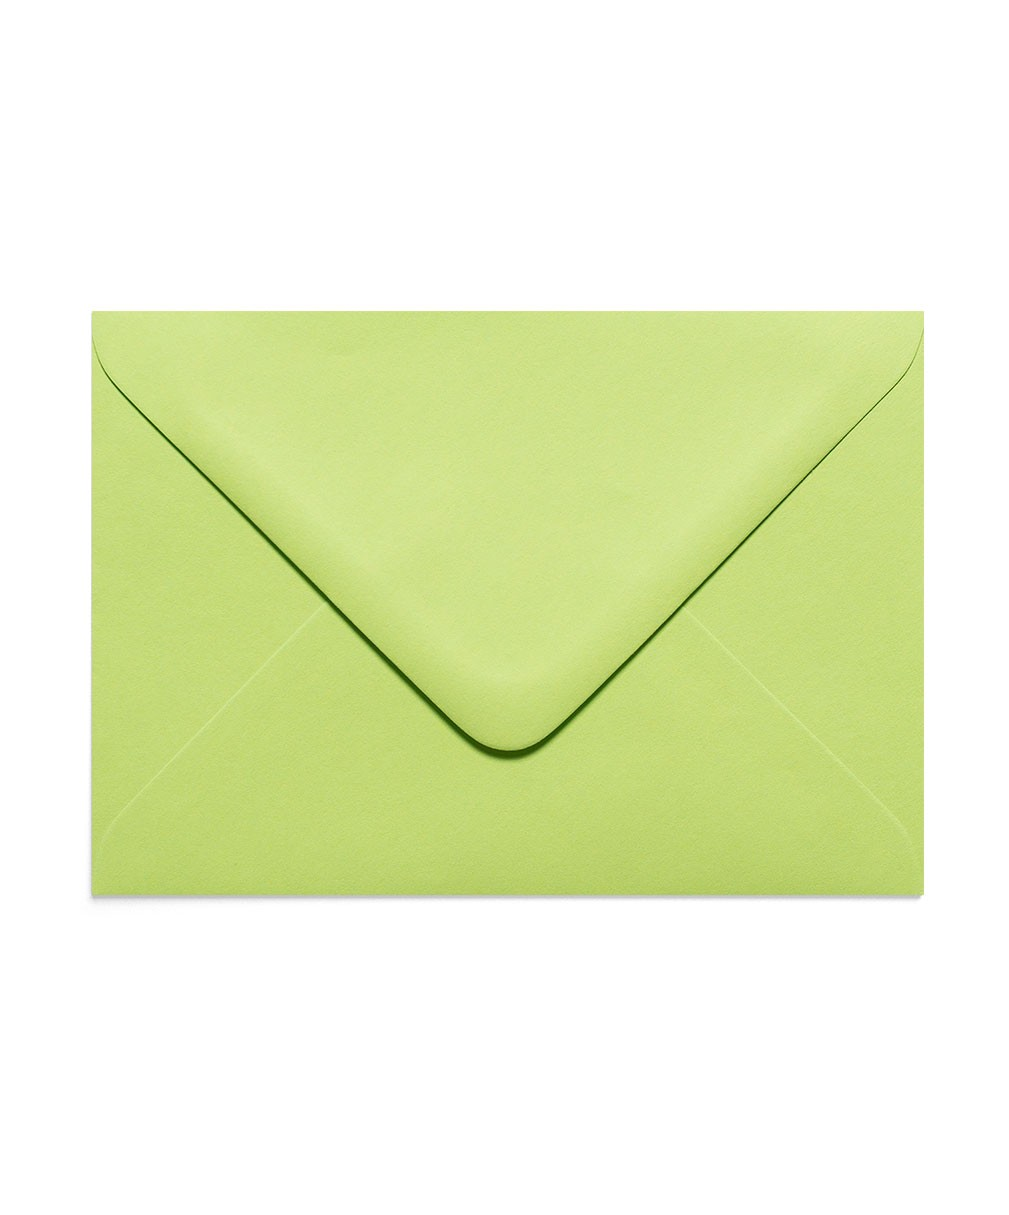 Plic i8 verde crud